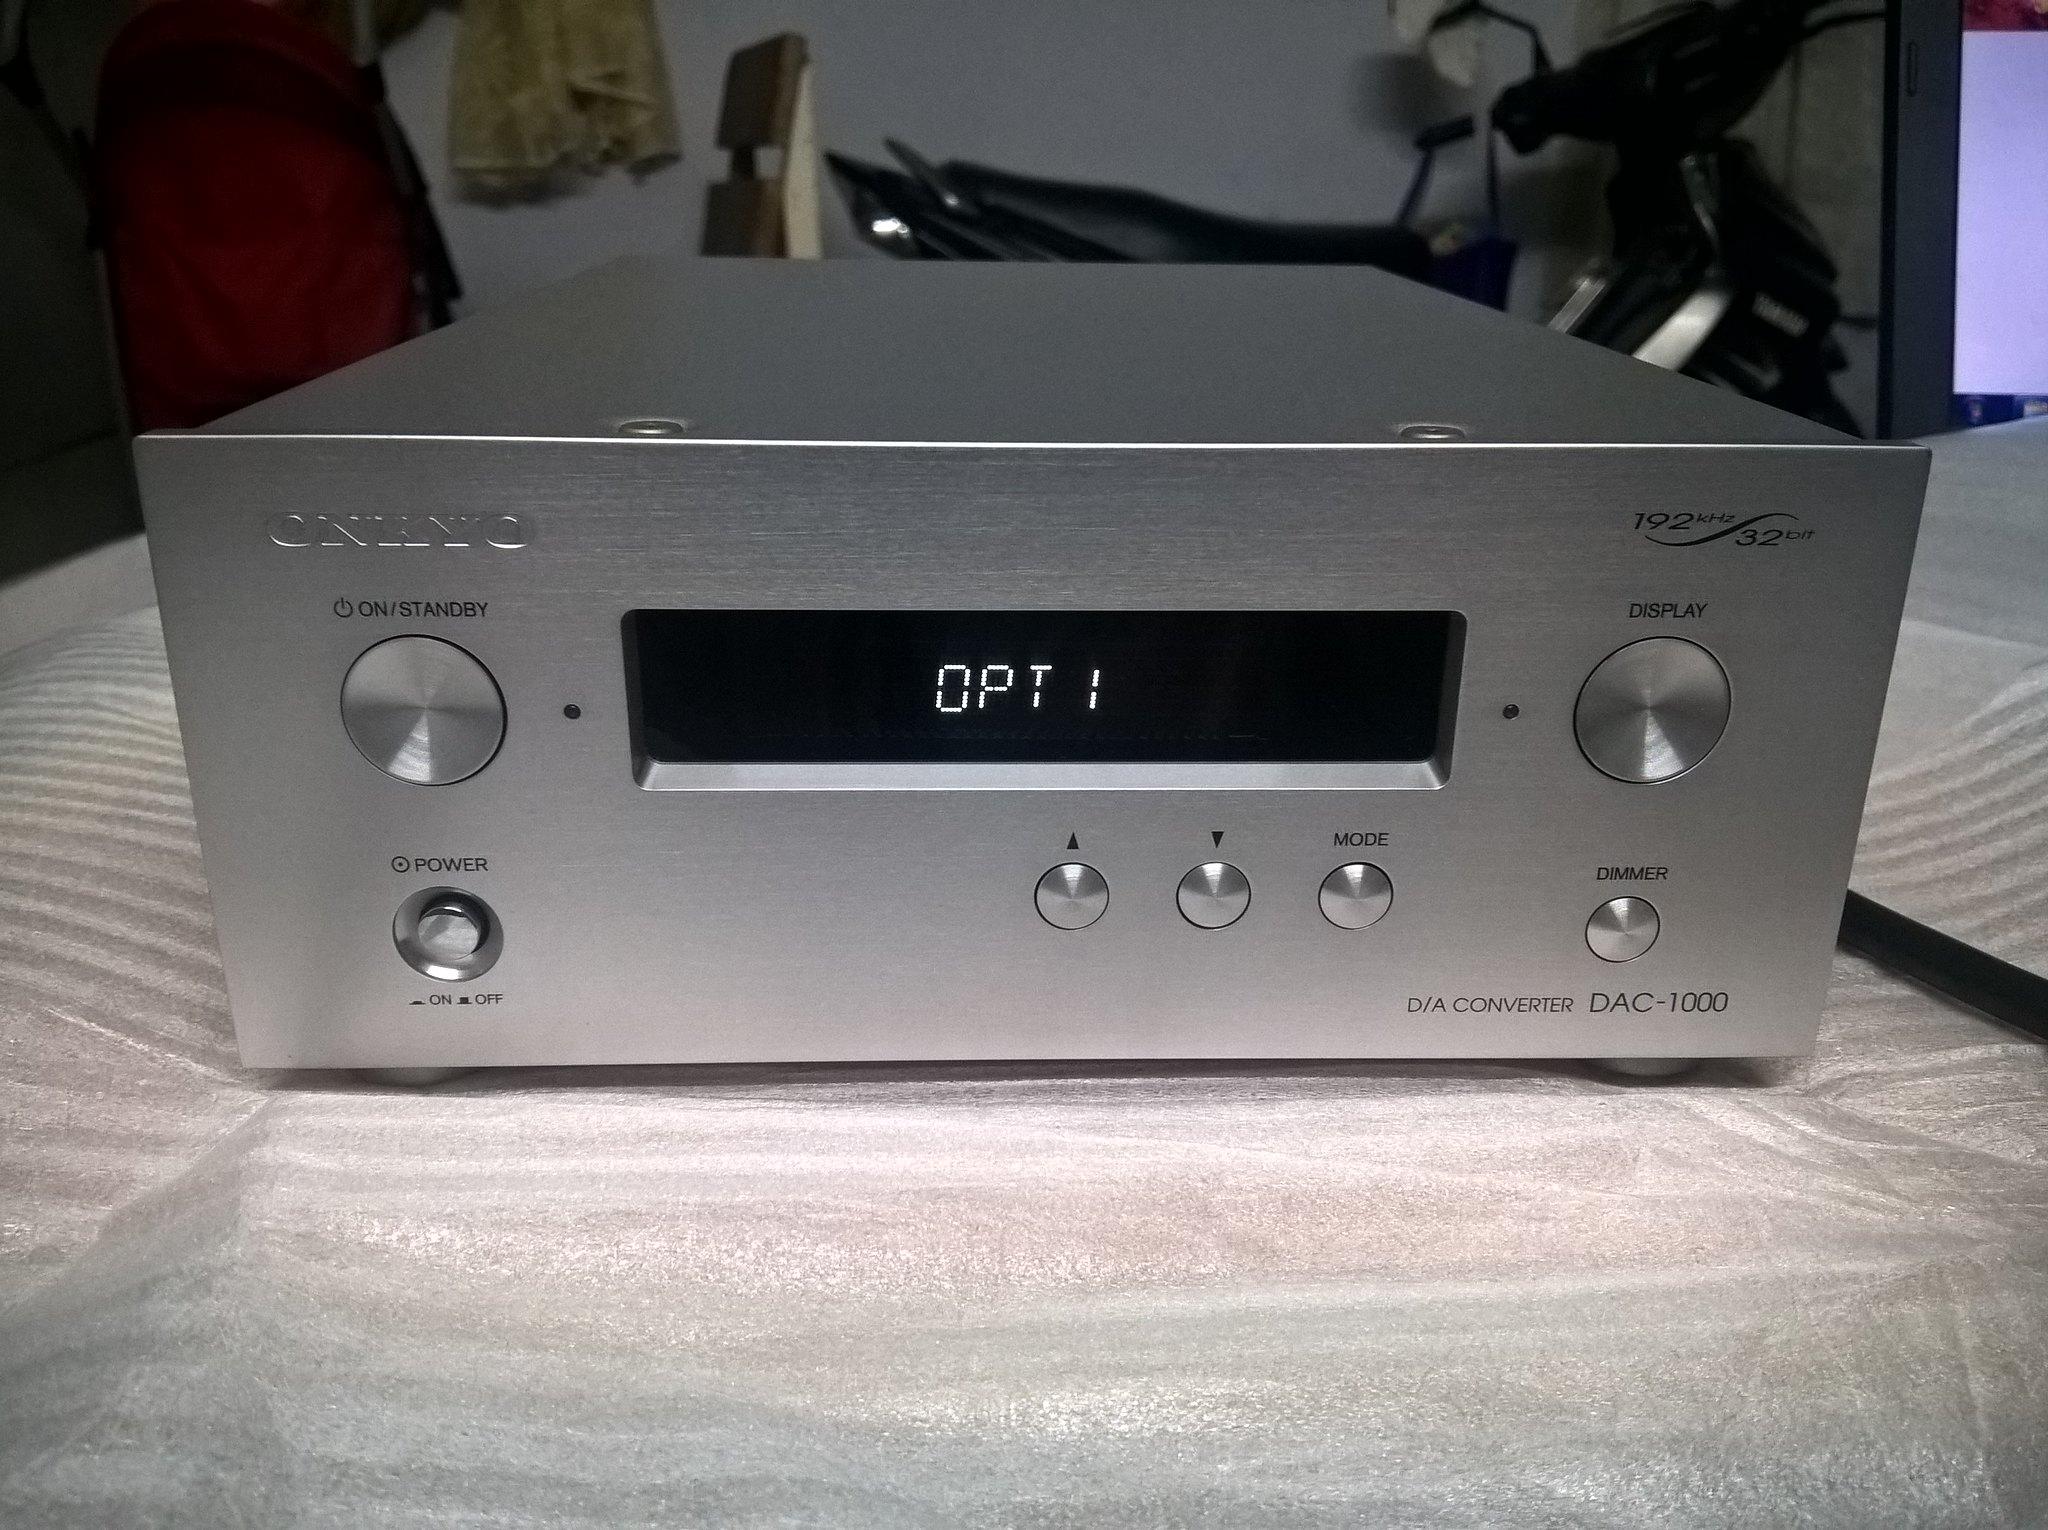 Onkyo từ Japan - U55SX, U55SX2, 200PCI LTD, 200PCI, 150PCI, 90PCI - 16